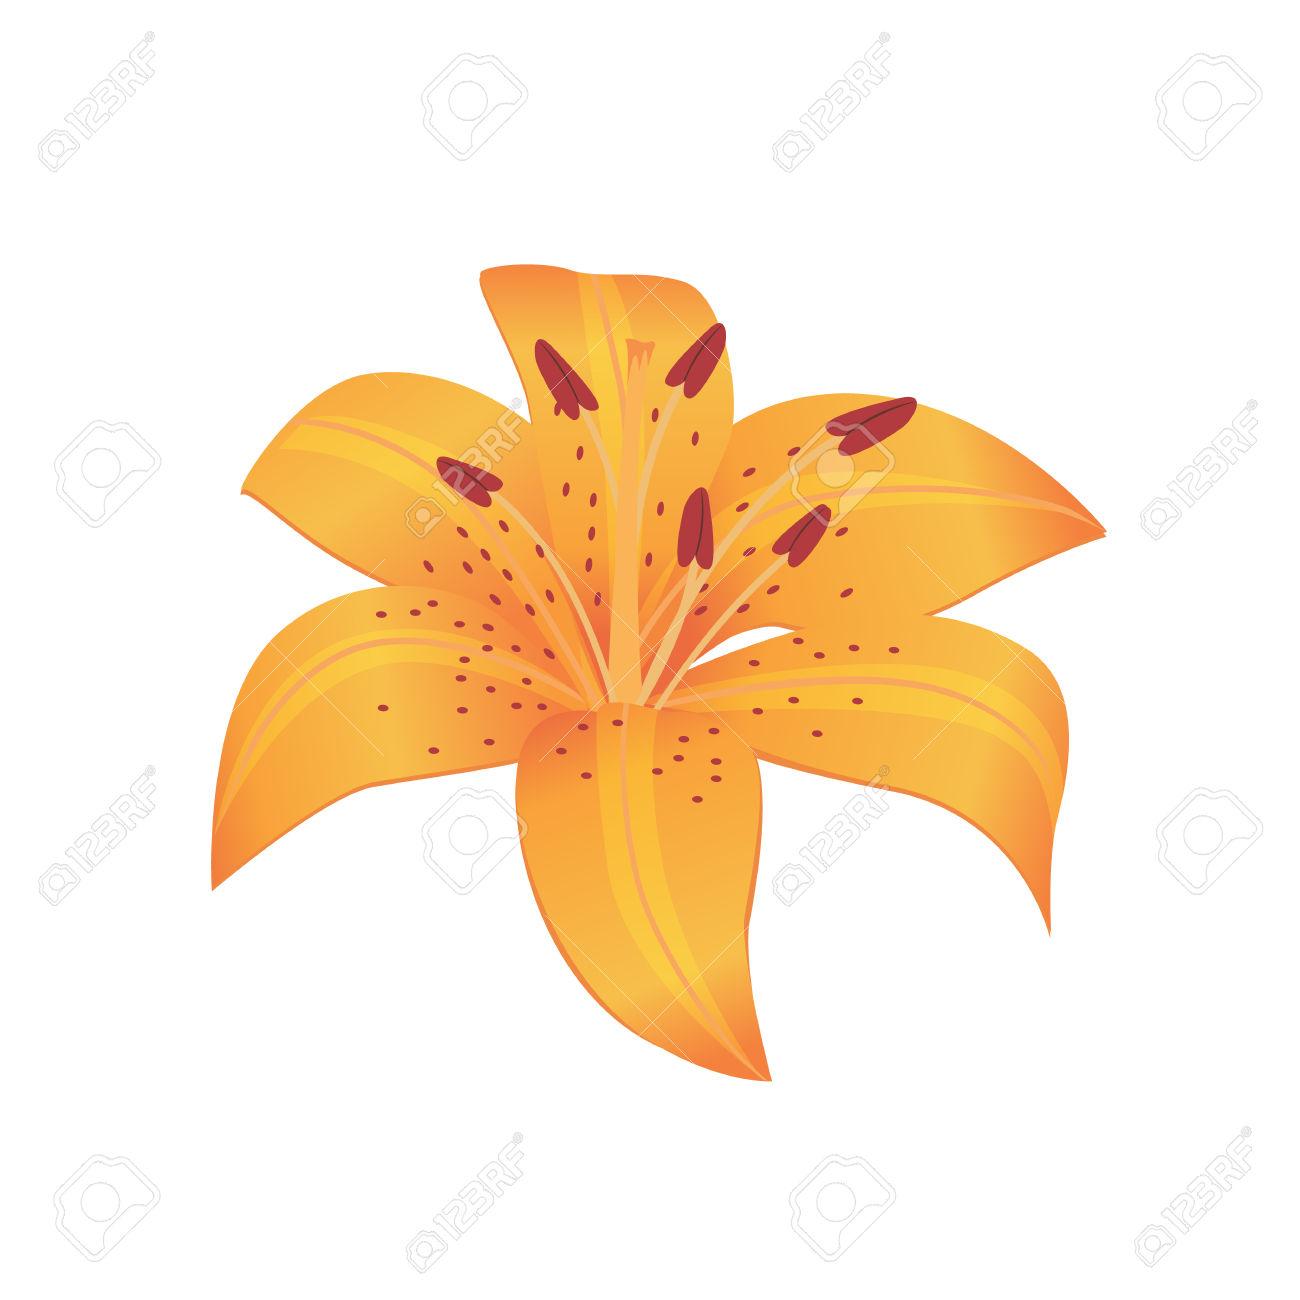 Beauty Flower Design Flat Style Isolated. Blooming Orange Flower.